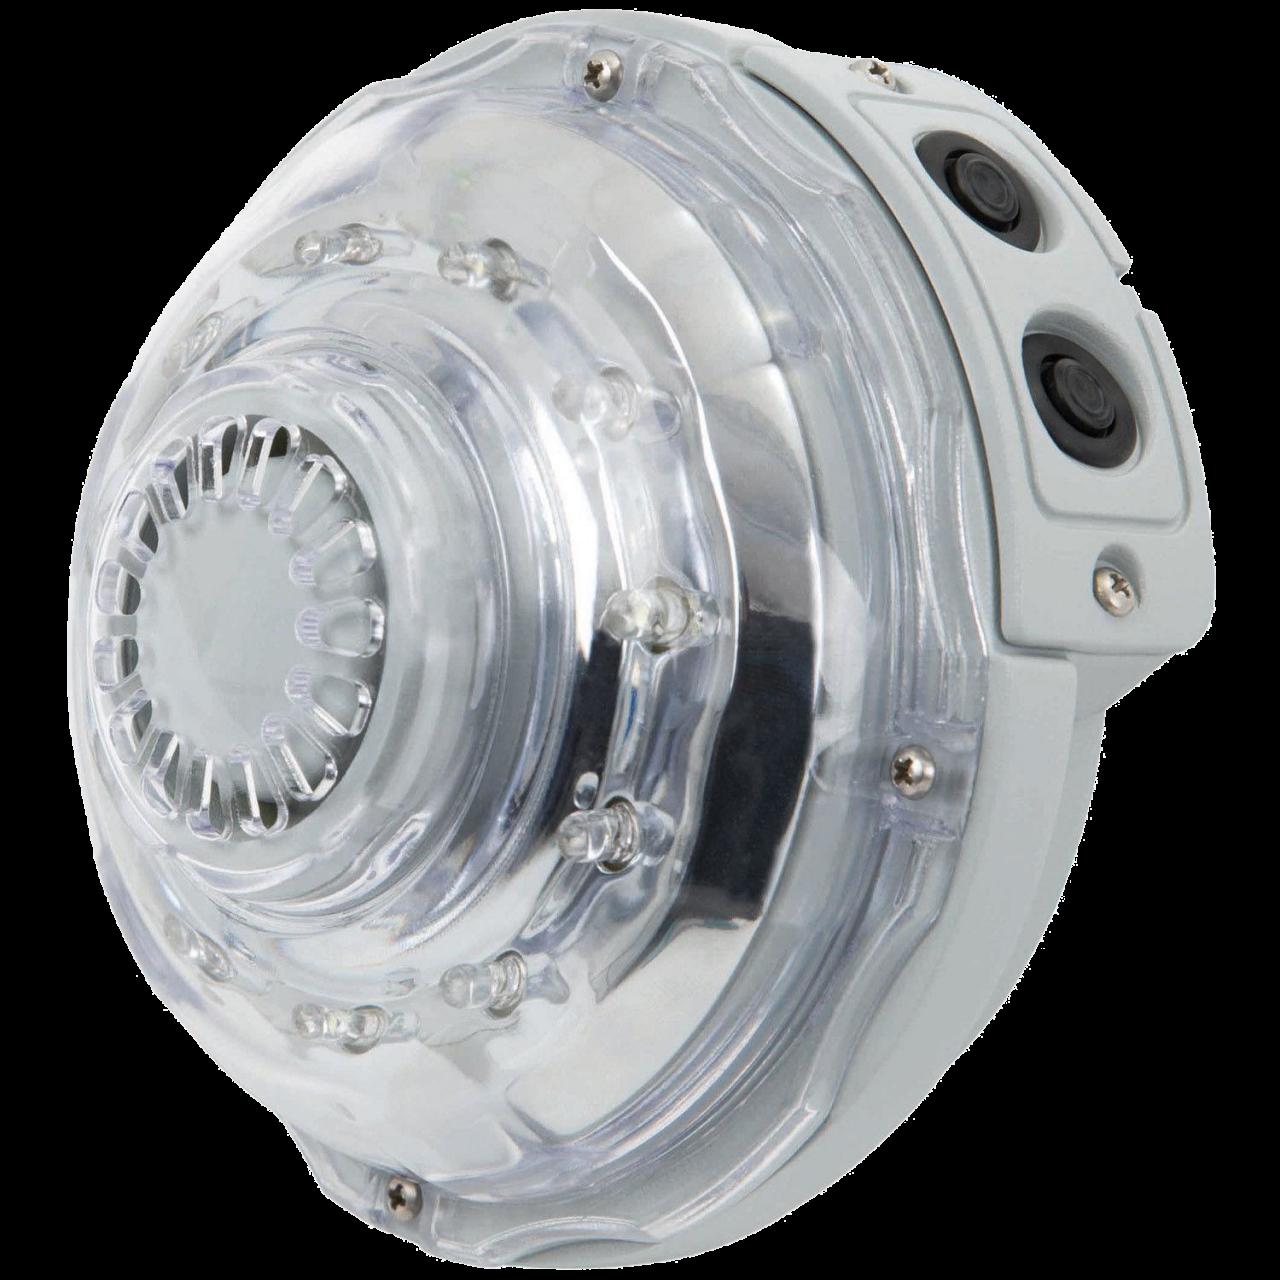 Intex LED Licht Beleuchtung 5 Farben Whirlpool für Intex Jet & Bubble Deluxe SPA